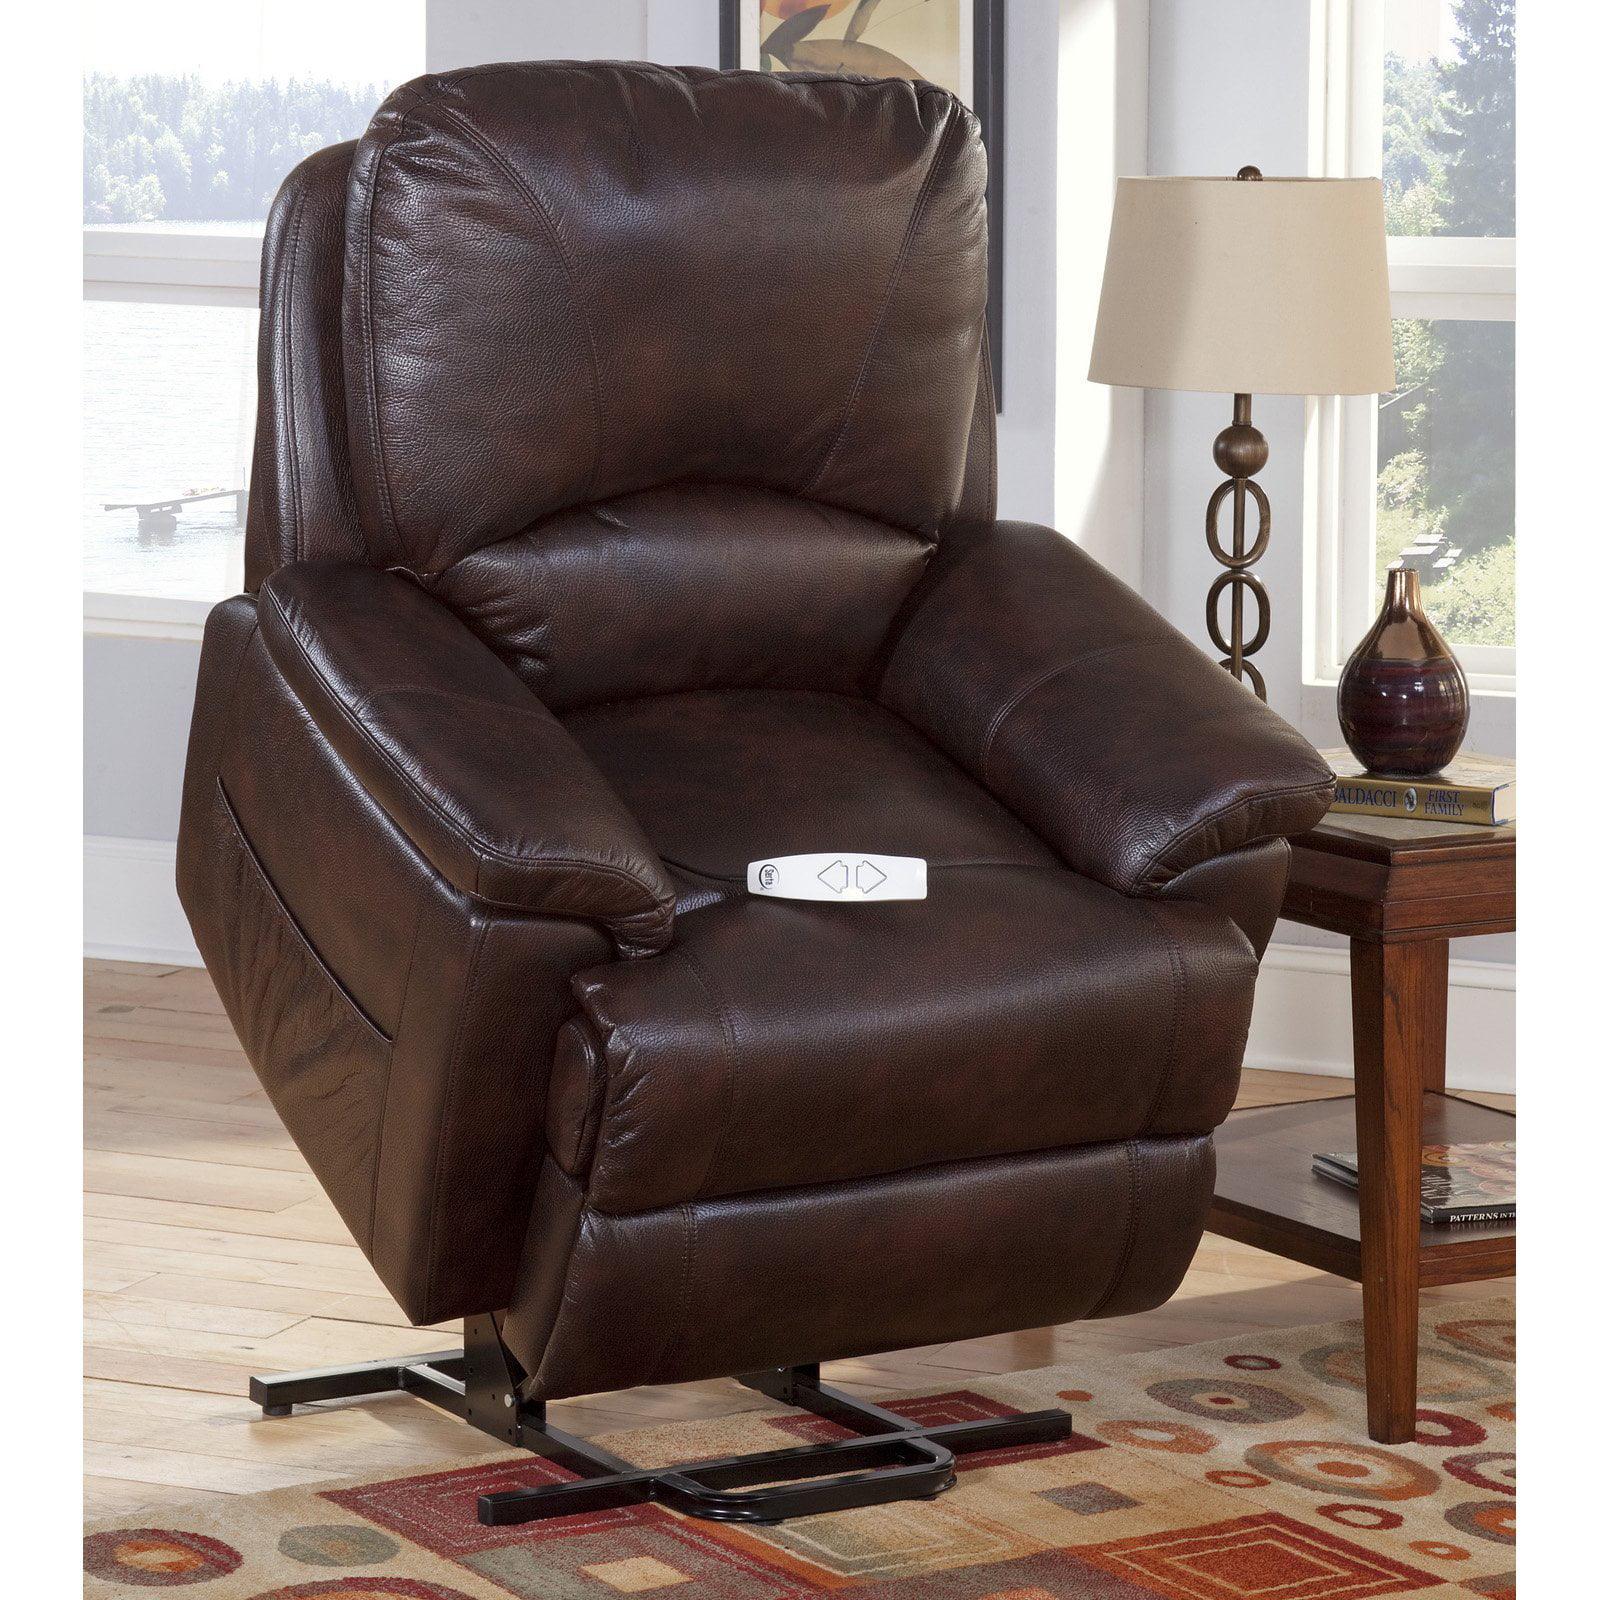 Serta Living Room FurnitureWalmartcom